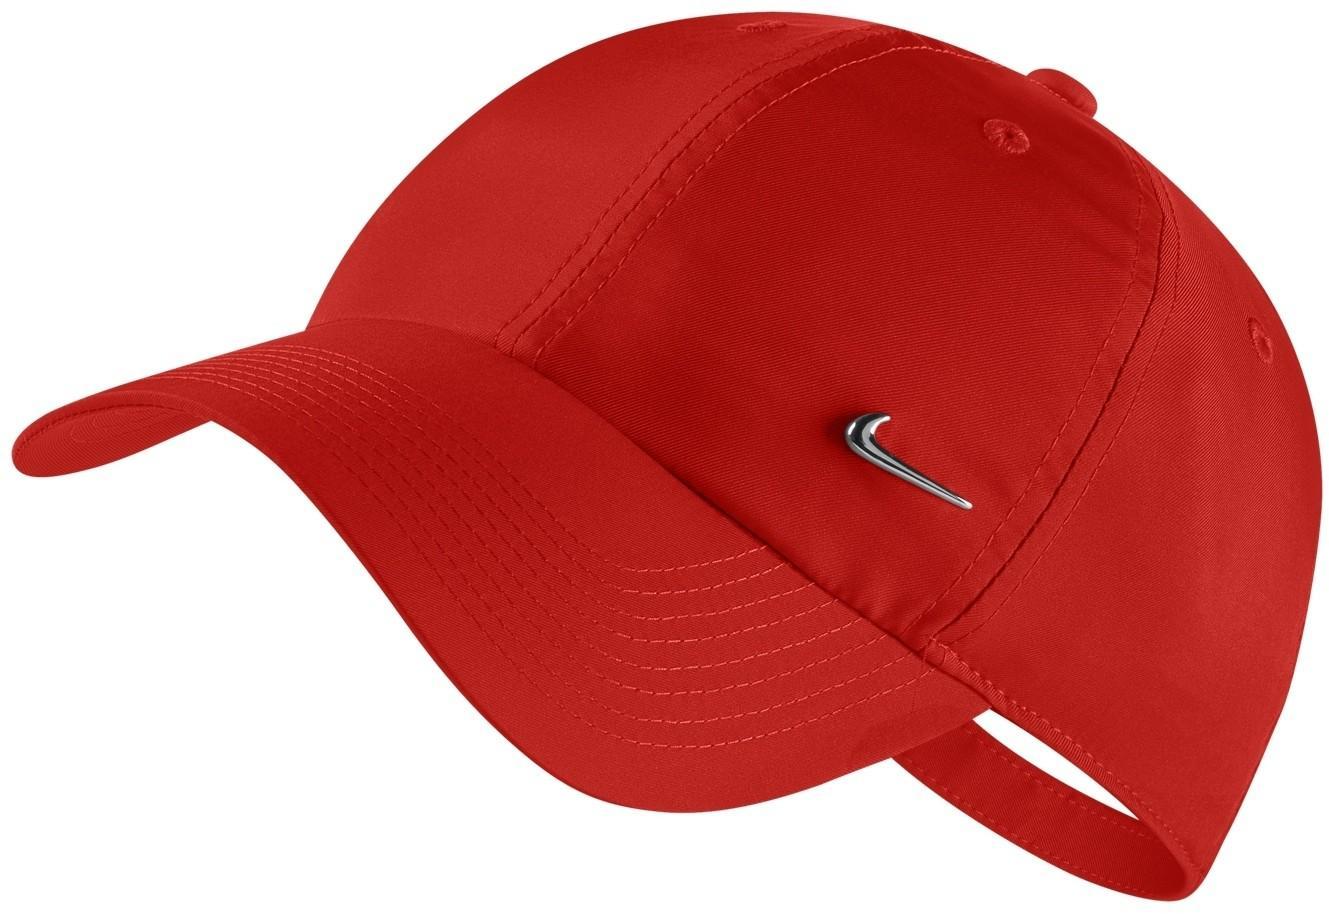 Теннисная кепка Nike H86 Metal Swoosh Cap rush coral/metallic silver